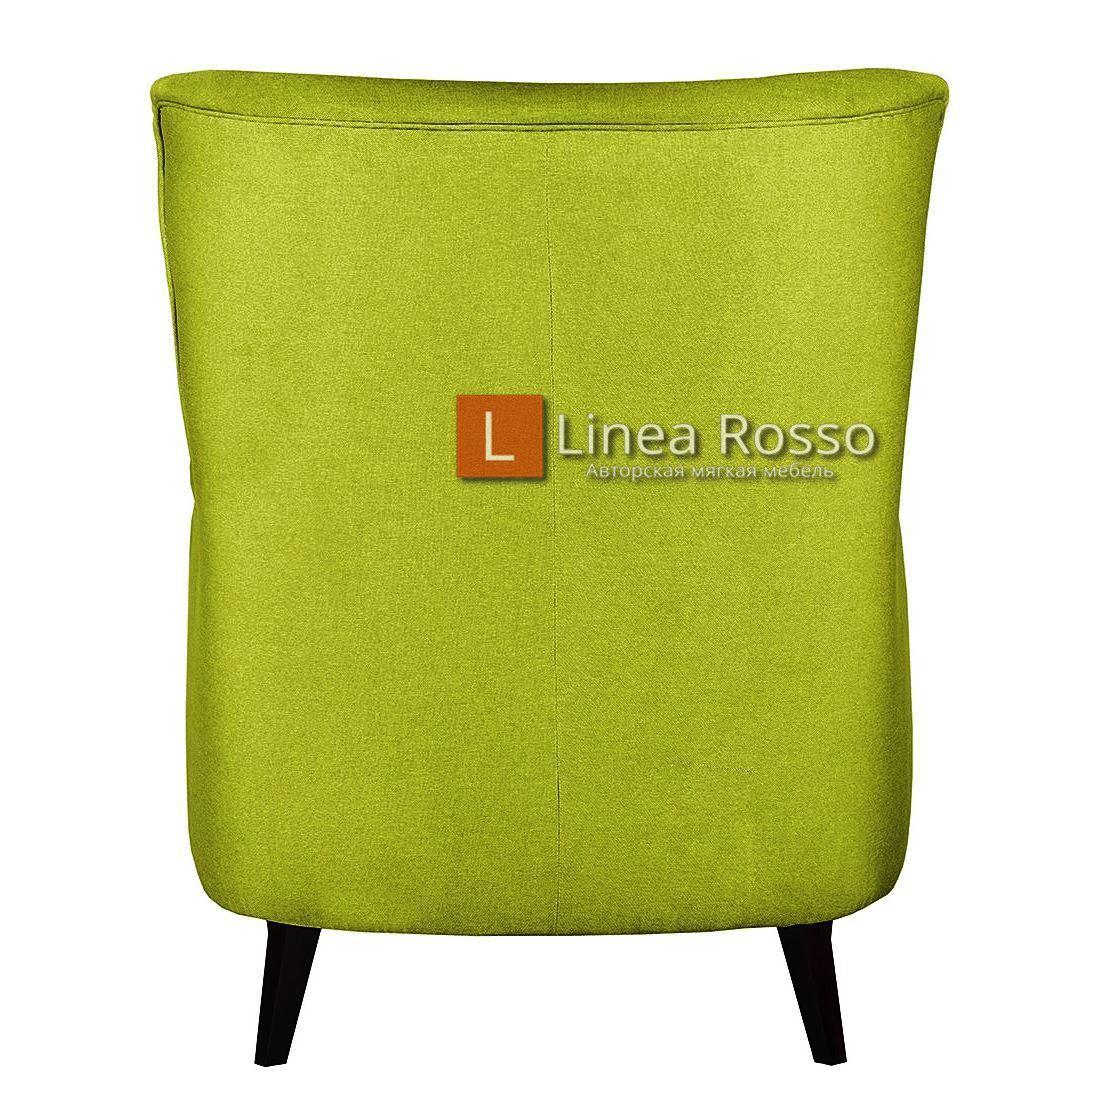 salatovoe kreslo7 - Кресло в салатовом цвете на заказ